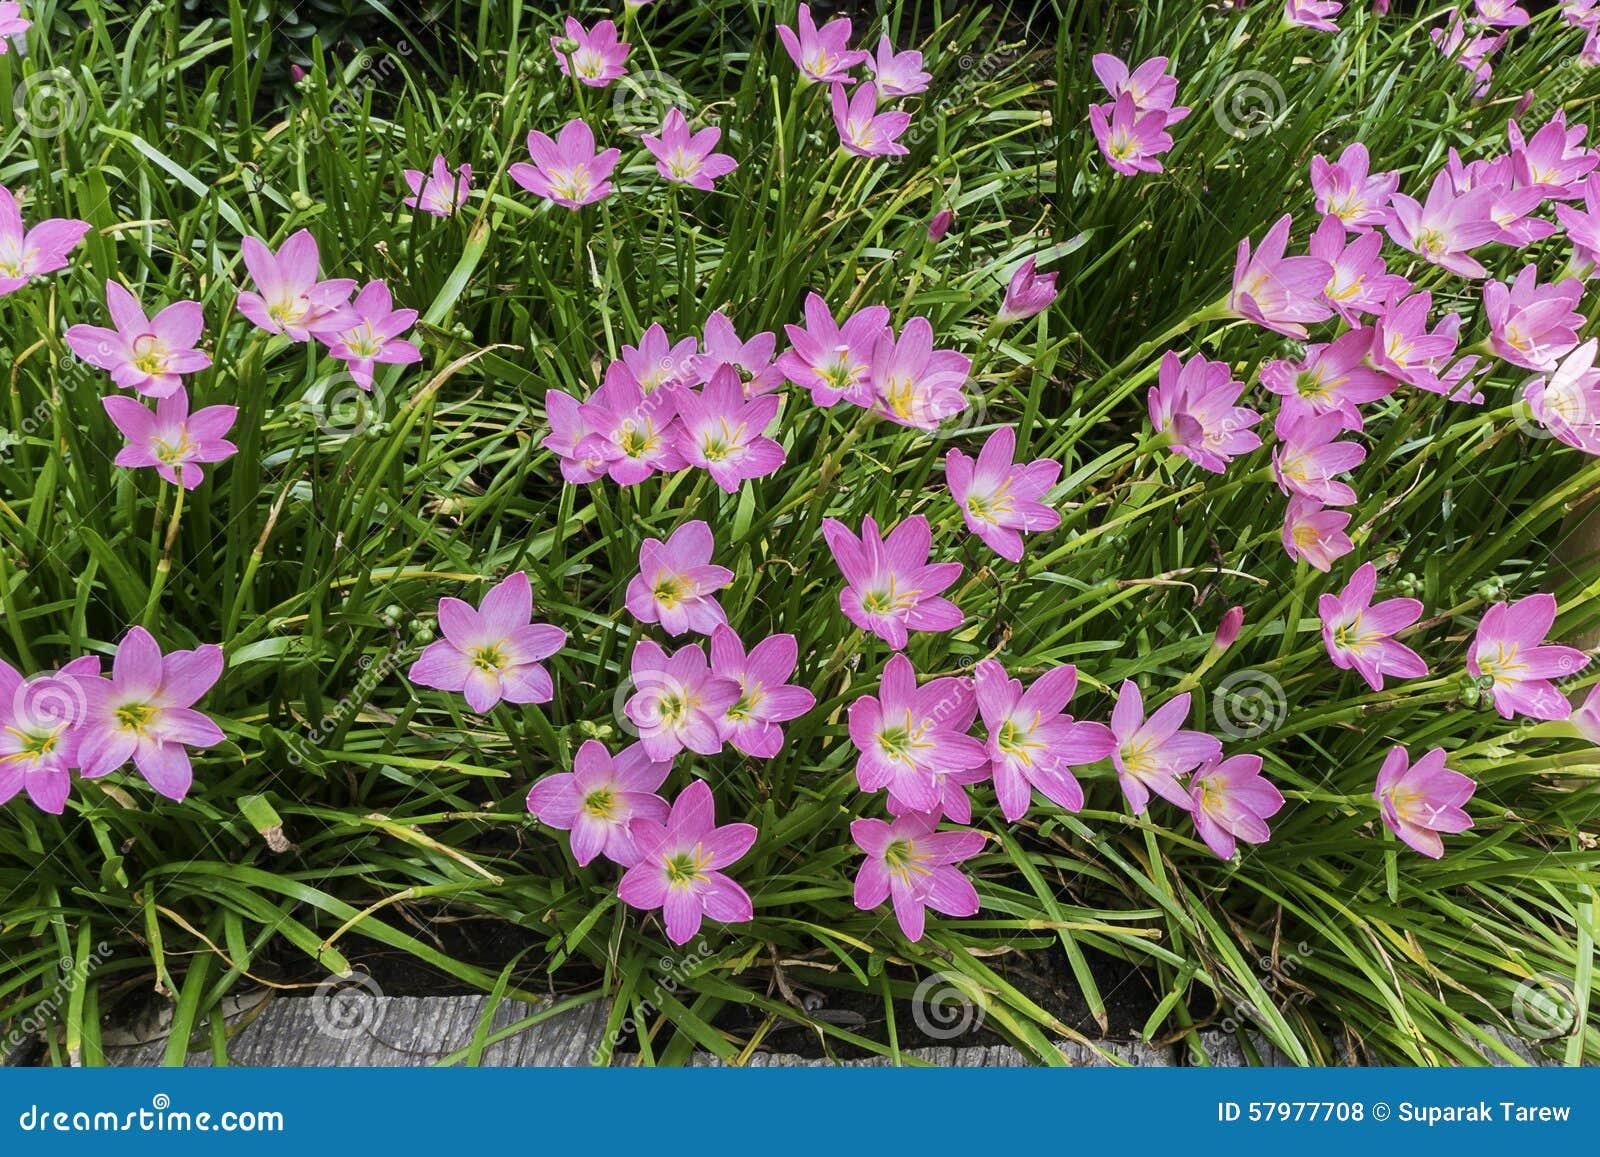 Beautiful Pink Rain Lily Flower Stock Photo Image Of Elegance